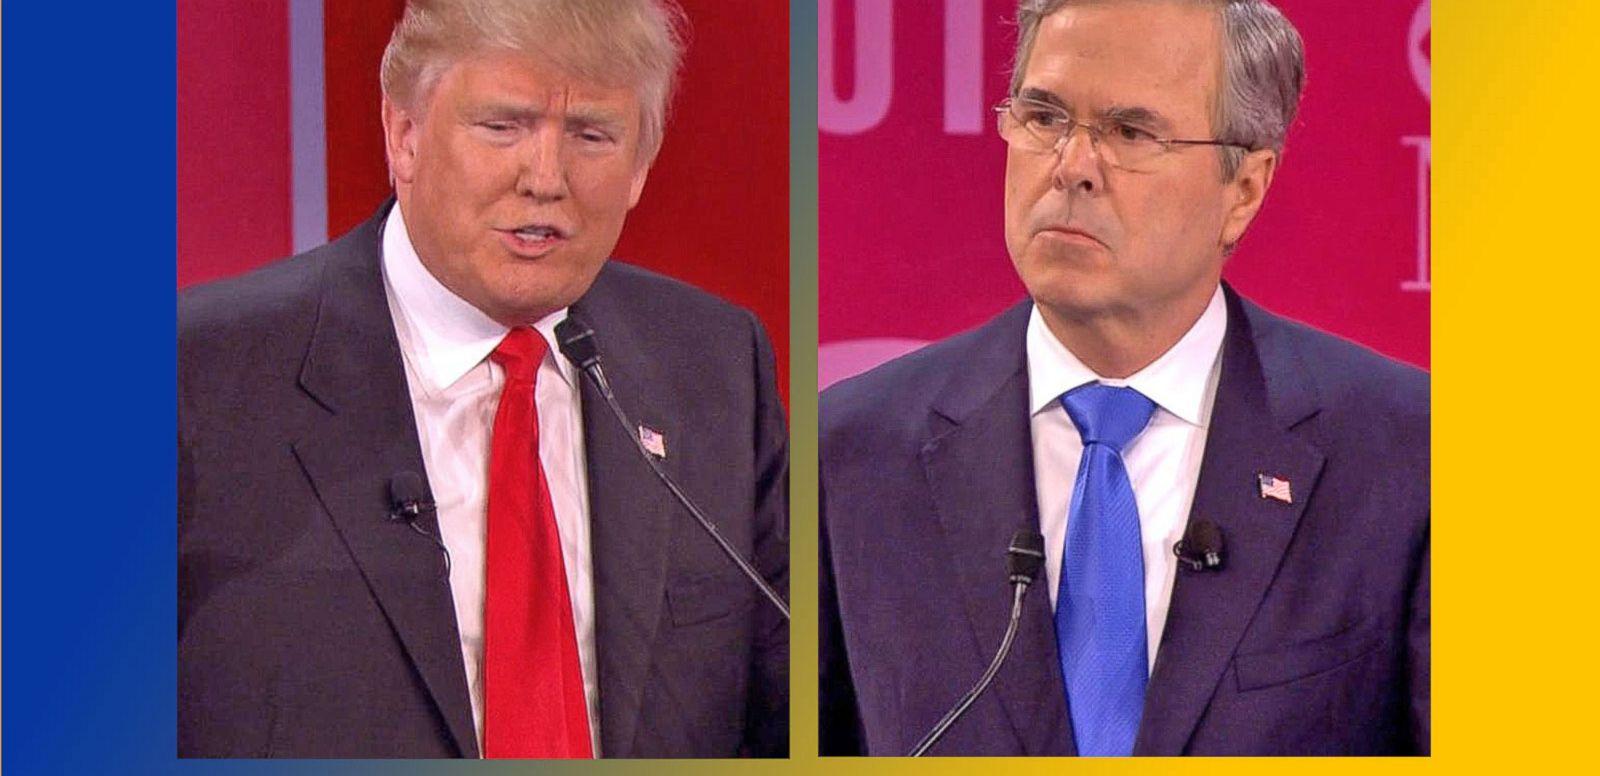 VIDEO: Nastiness Rises in Latest GOP Debate